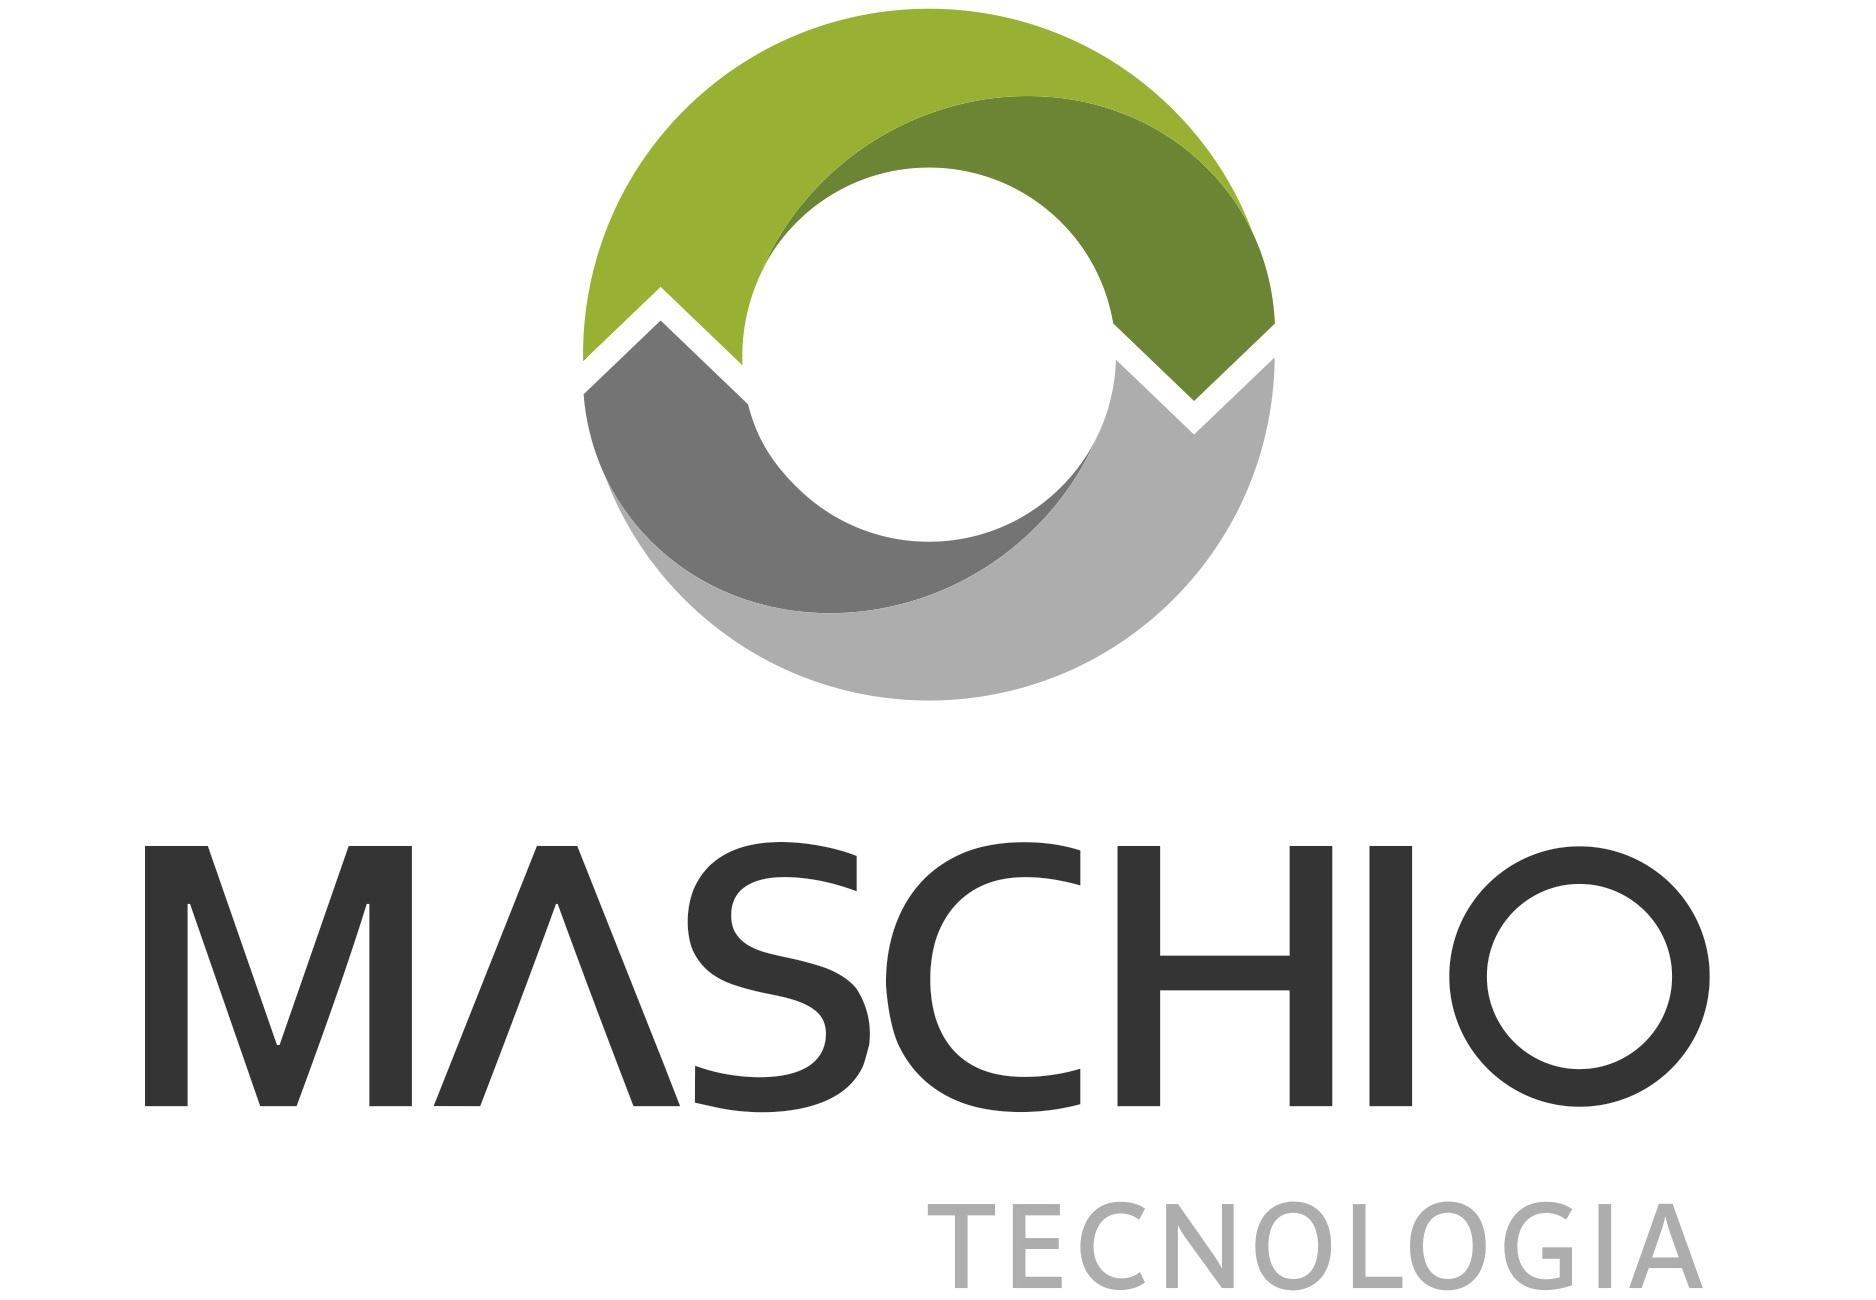 Maschio Tecnologia